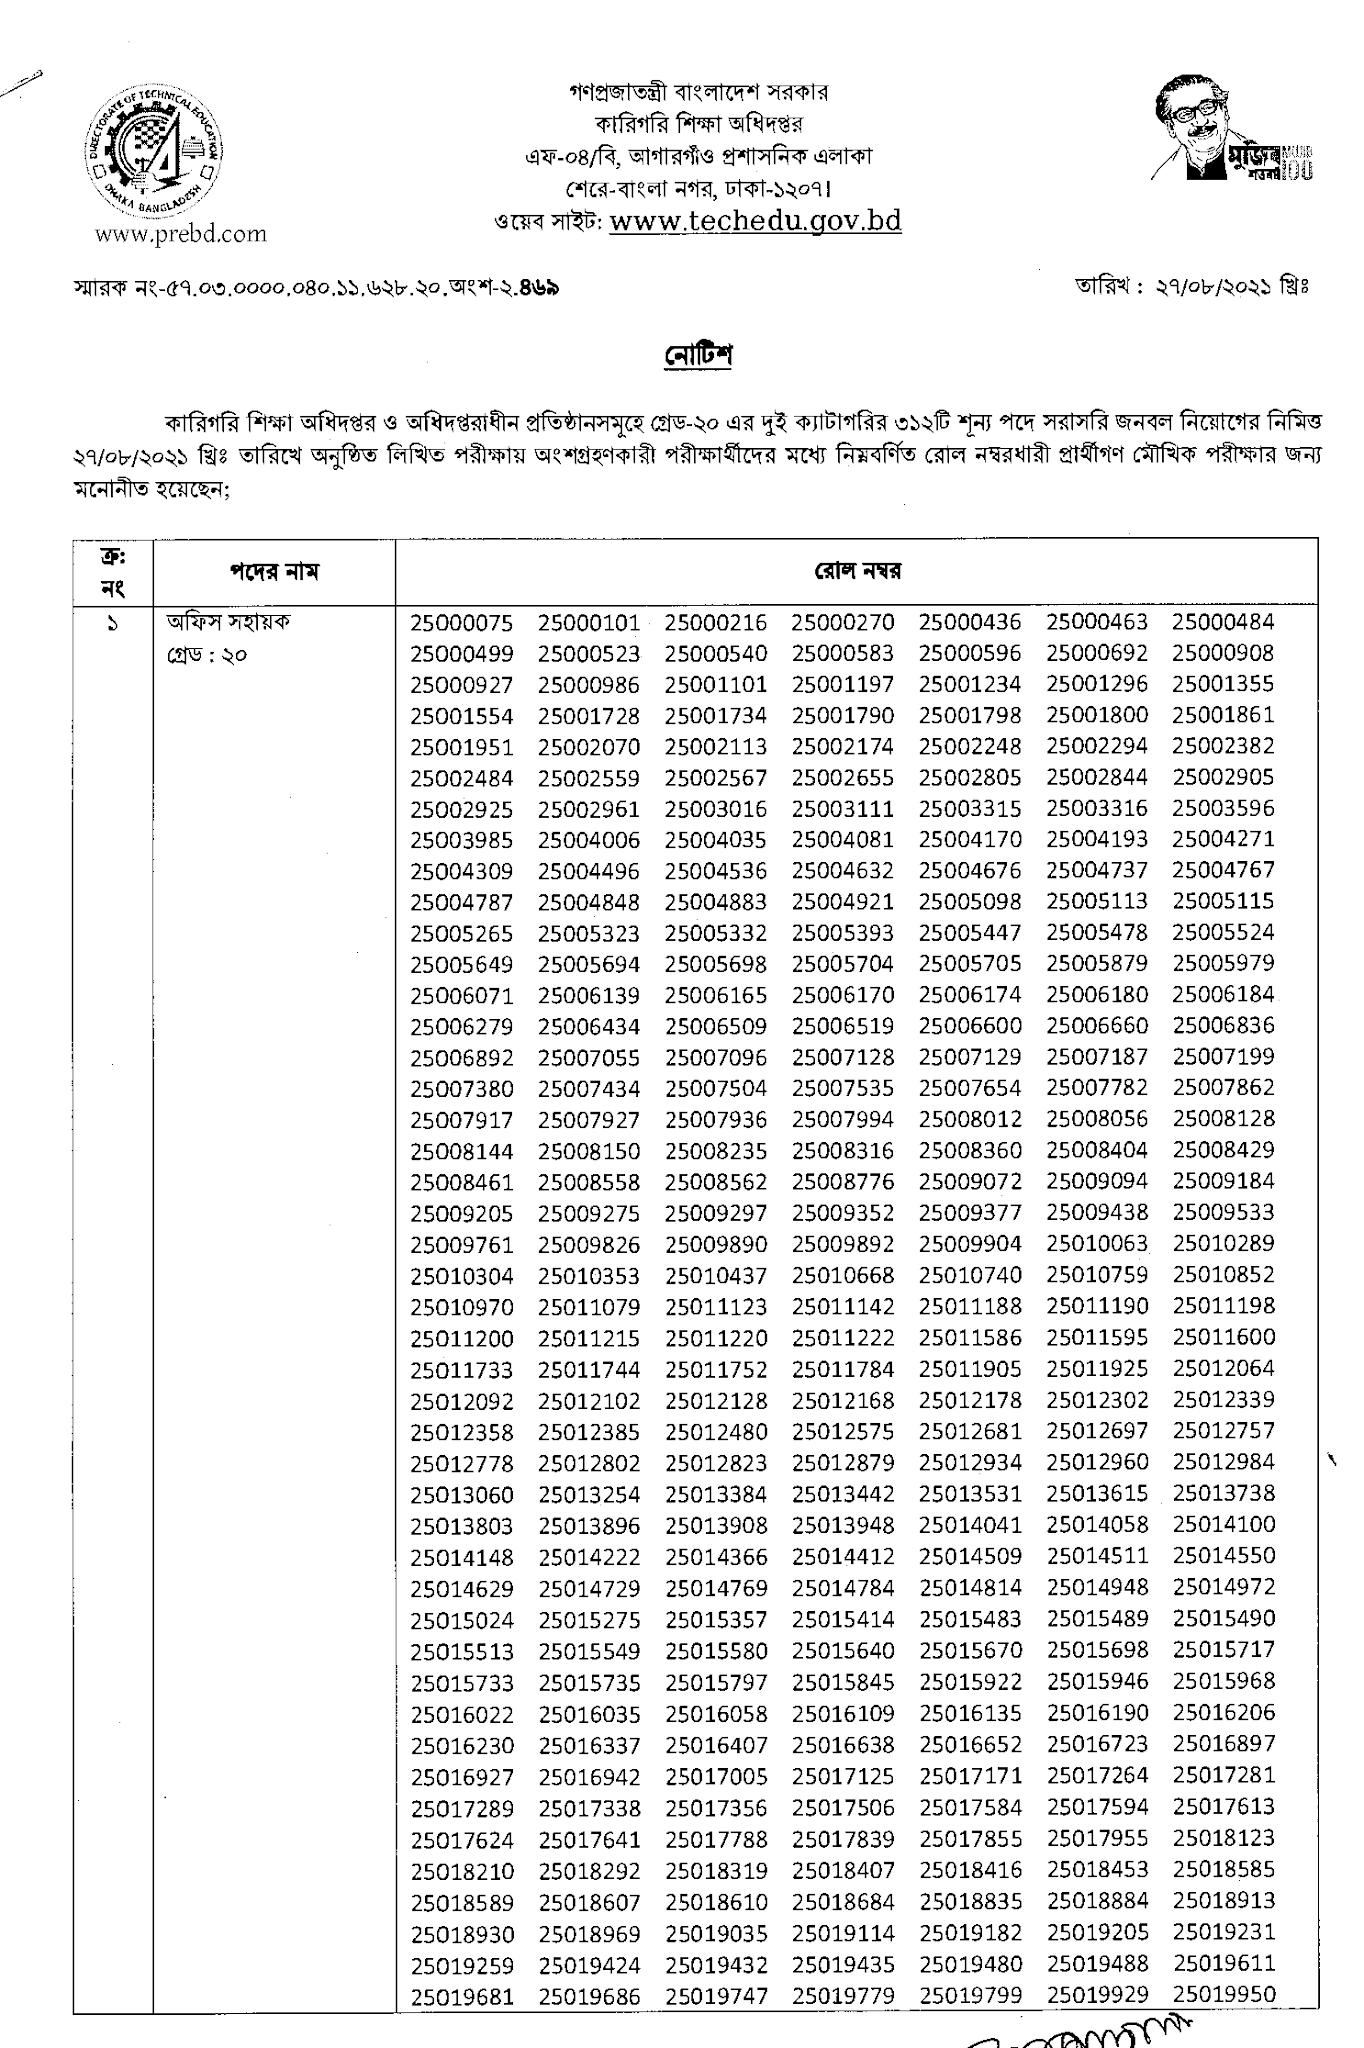 dte exam result